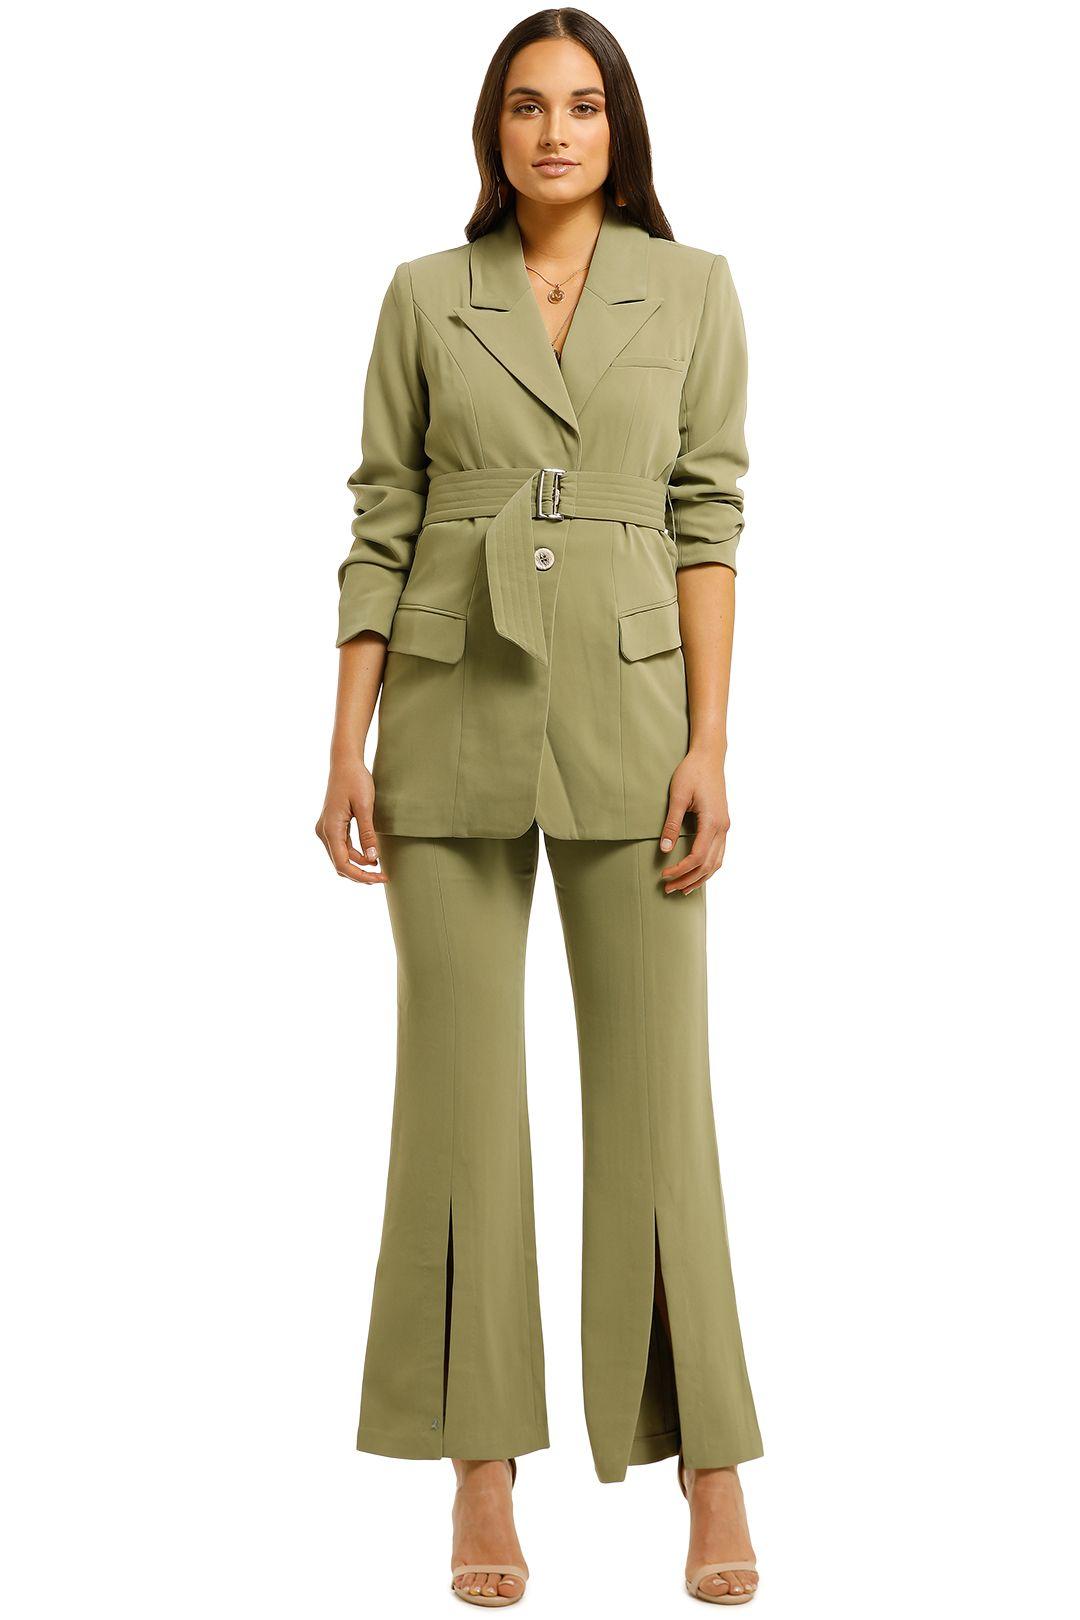 Elliatt-Coppelia-Blazer-and-Pant-Set-Khaki-Front